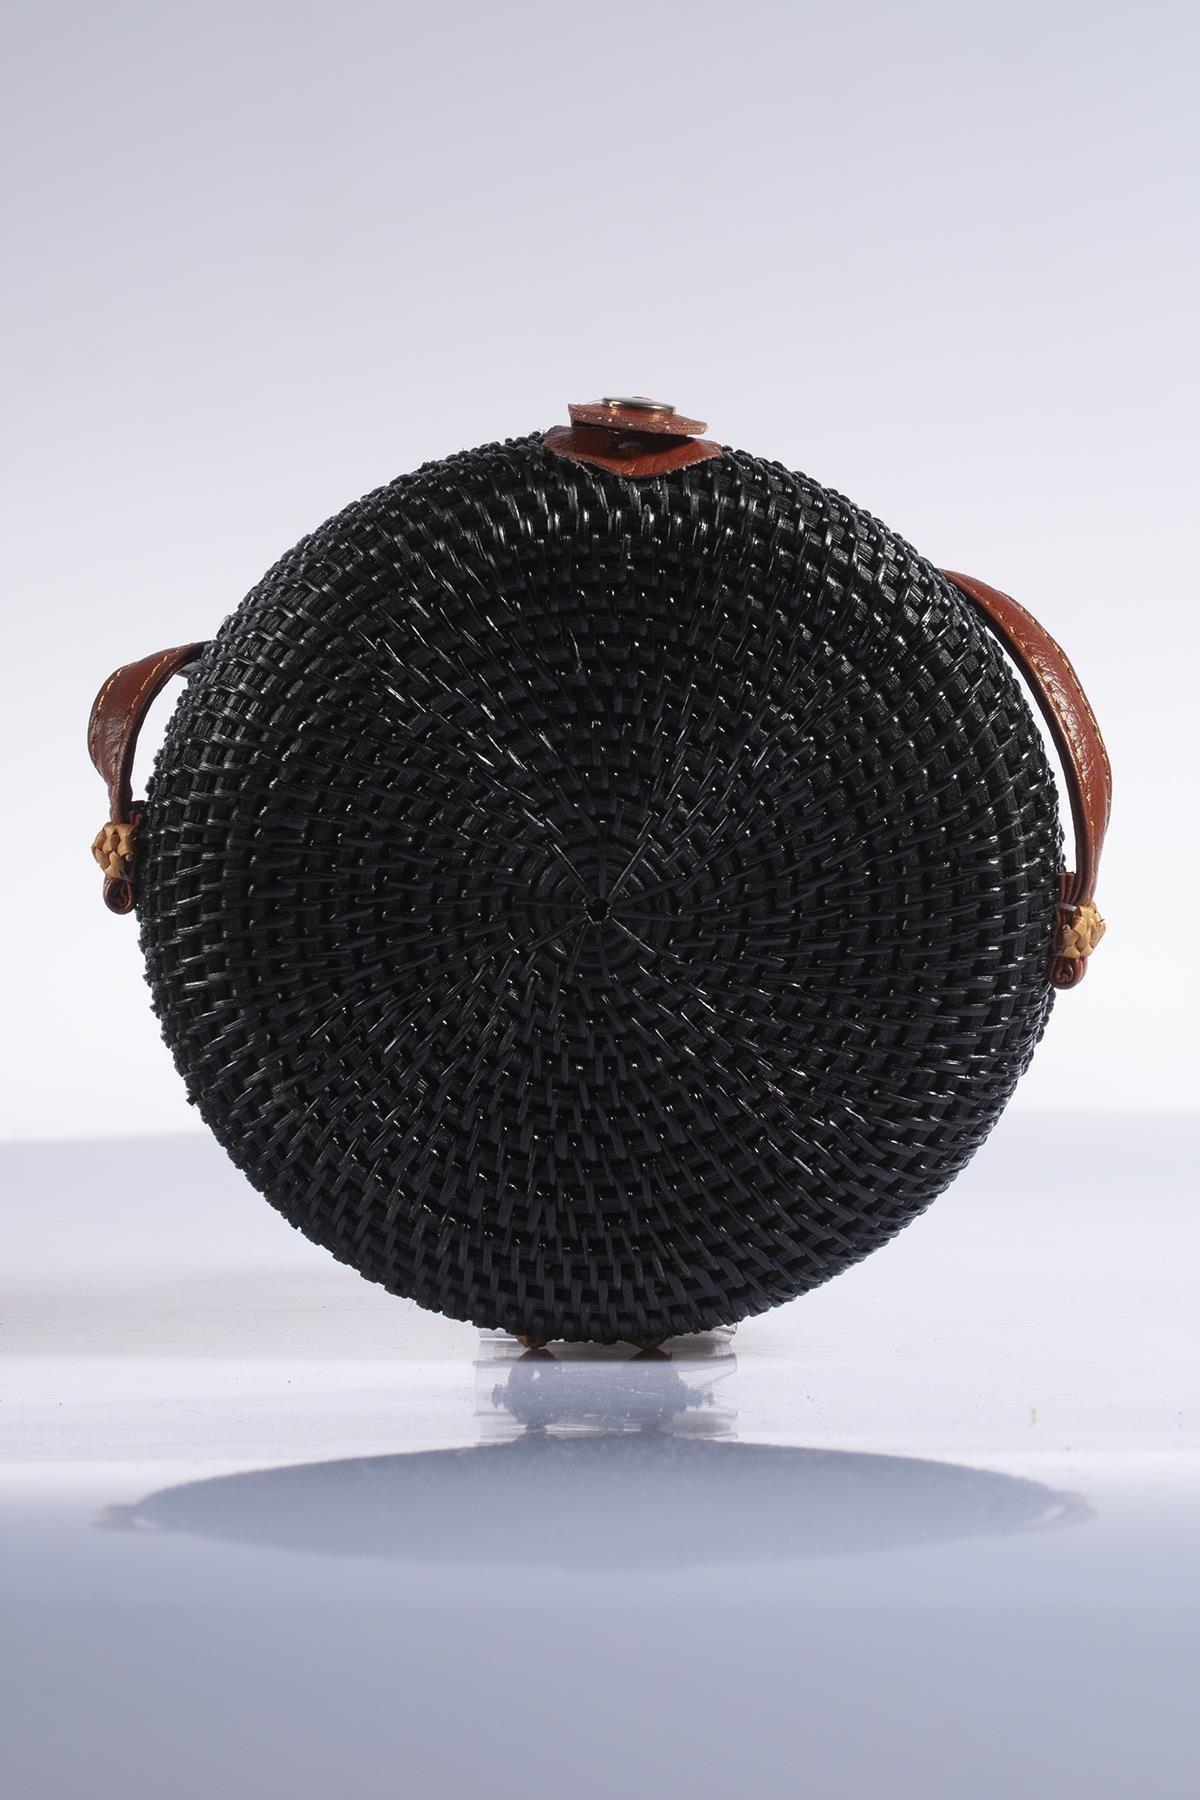 Sergio Giorgianni Kadın Siyah Hasır Omuz Çantası sghsr1023-siyah